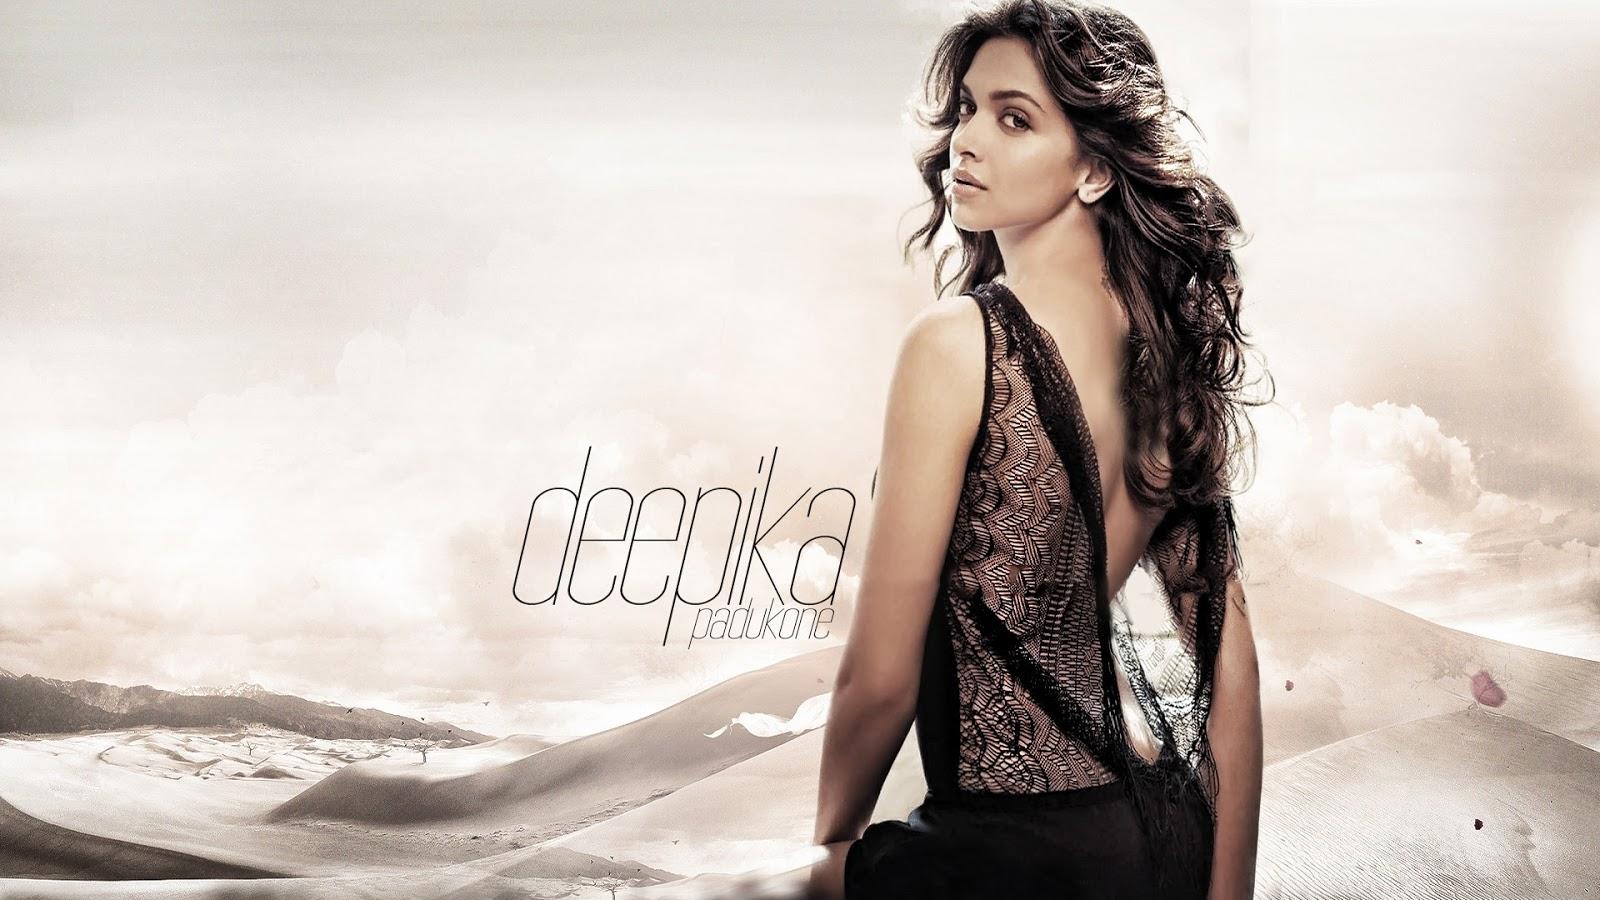 Deepika From Padmavat Hd Wallpaper: Deepika Padukone Bollywood Actress Hot And Sexy HD